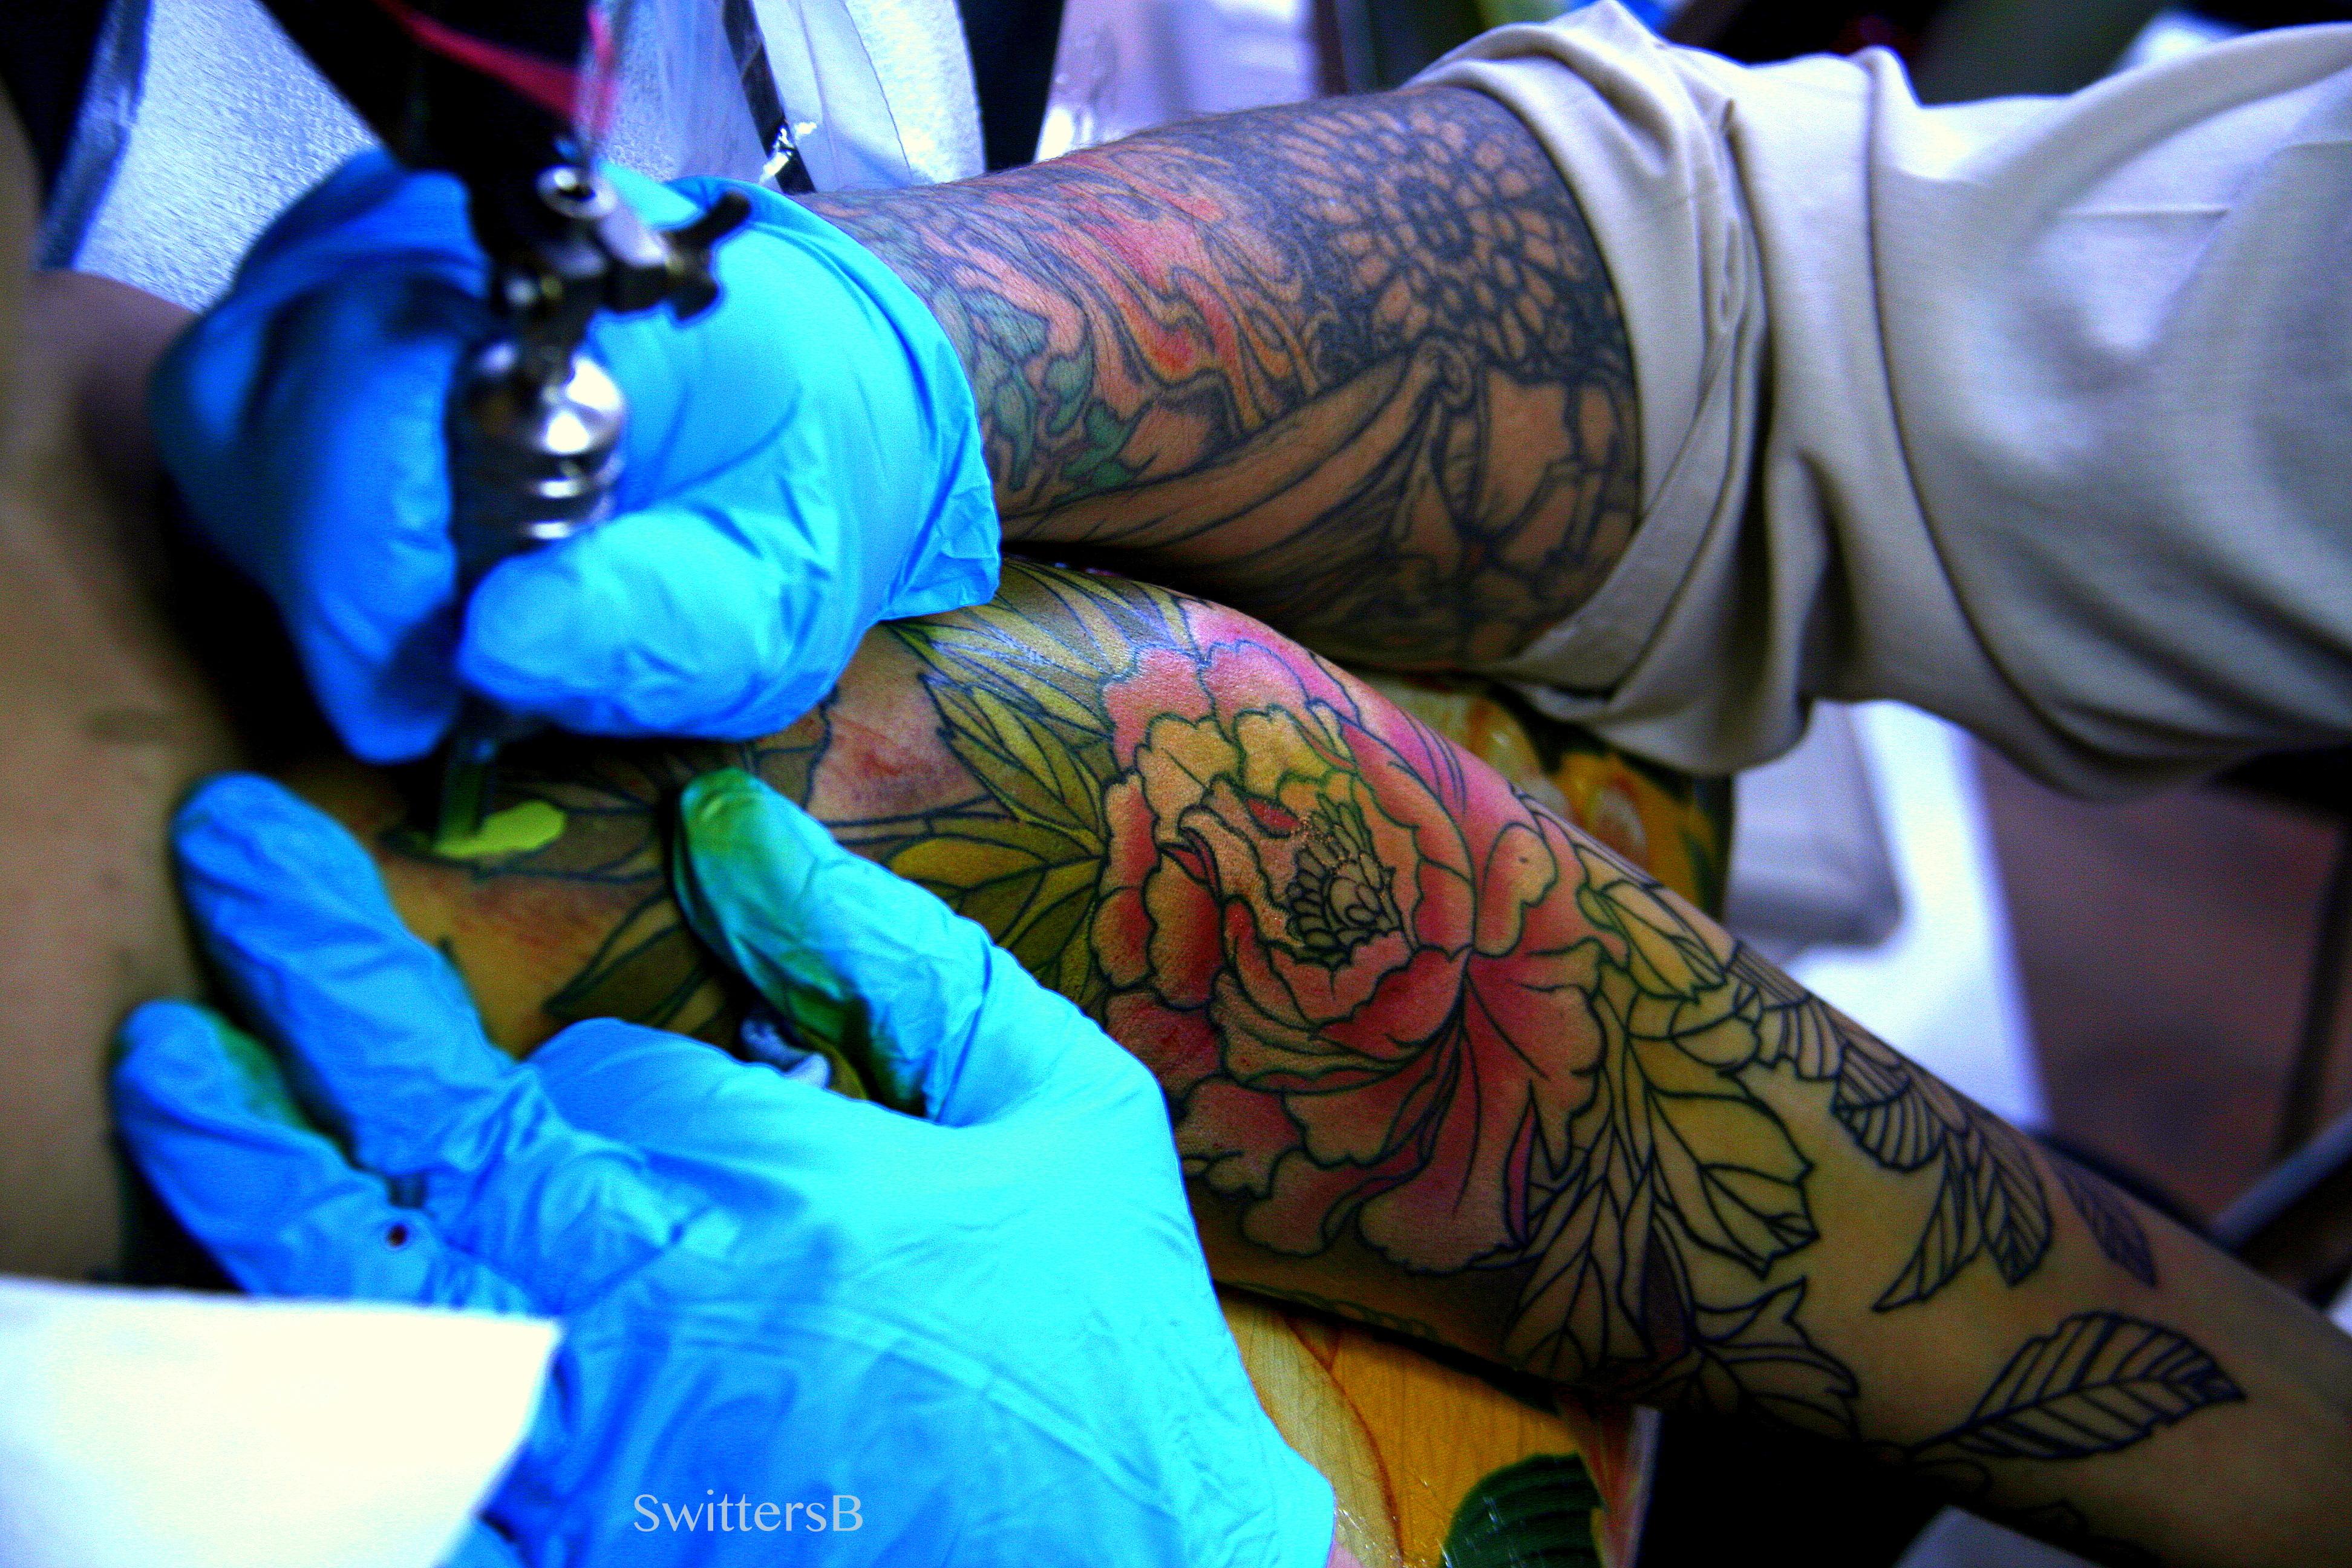 Peacock flower tattoo designs - Tattoos Peacock Flowers Paul Zenk Swittersb